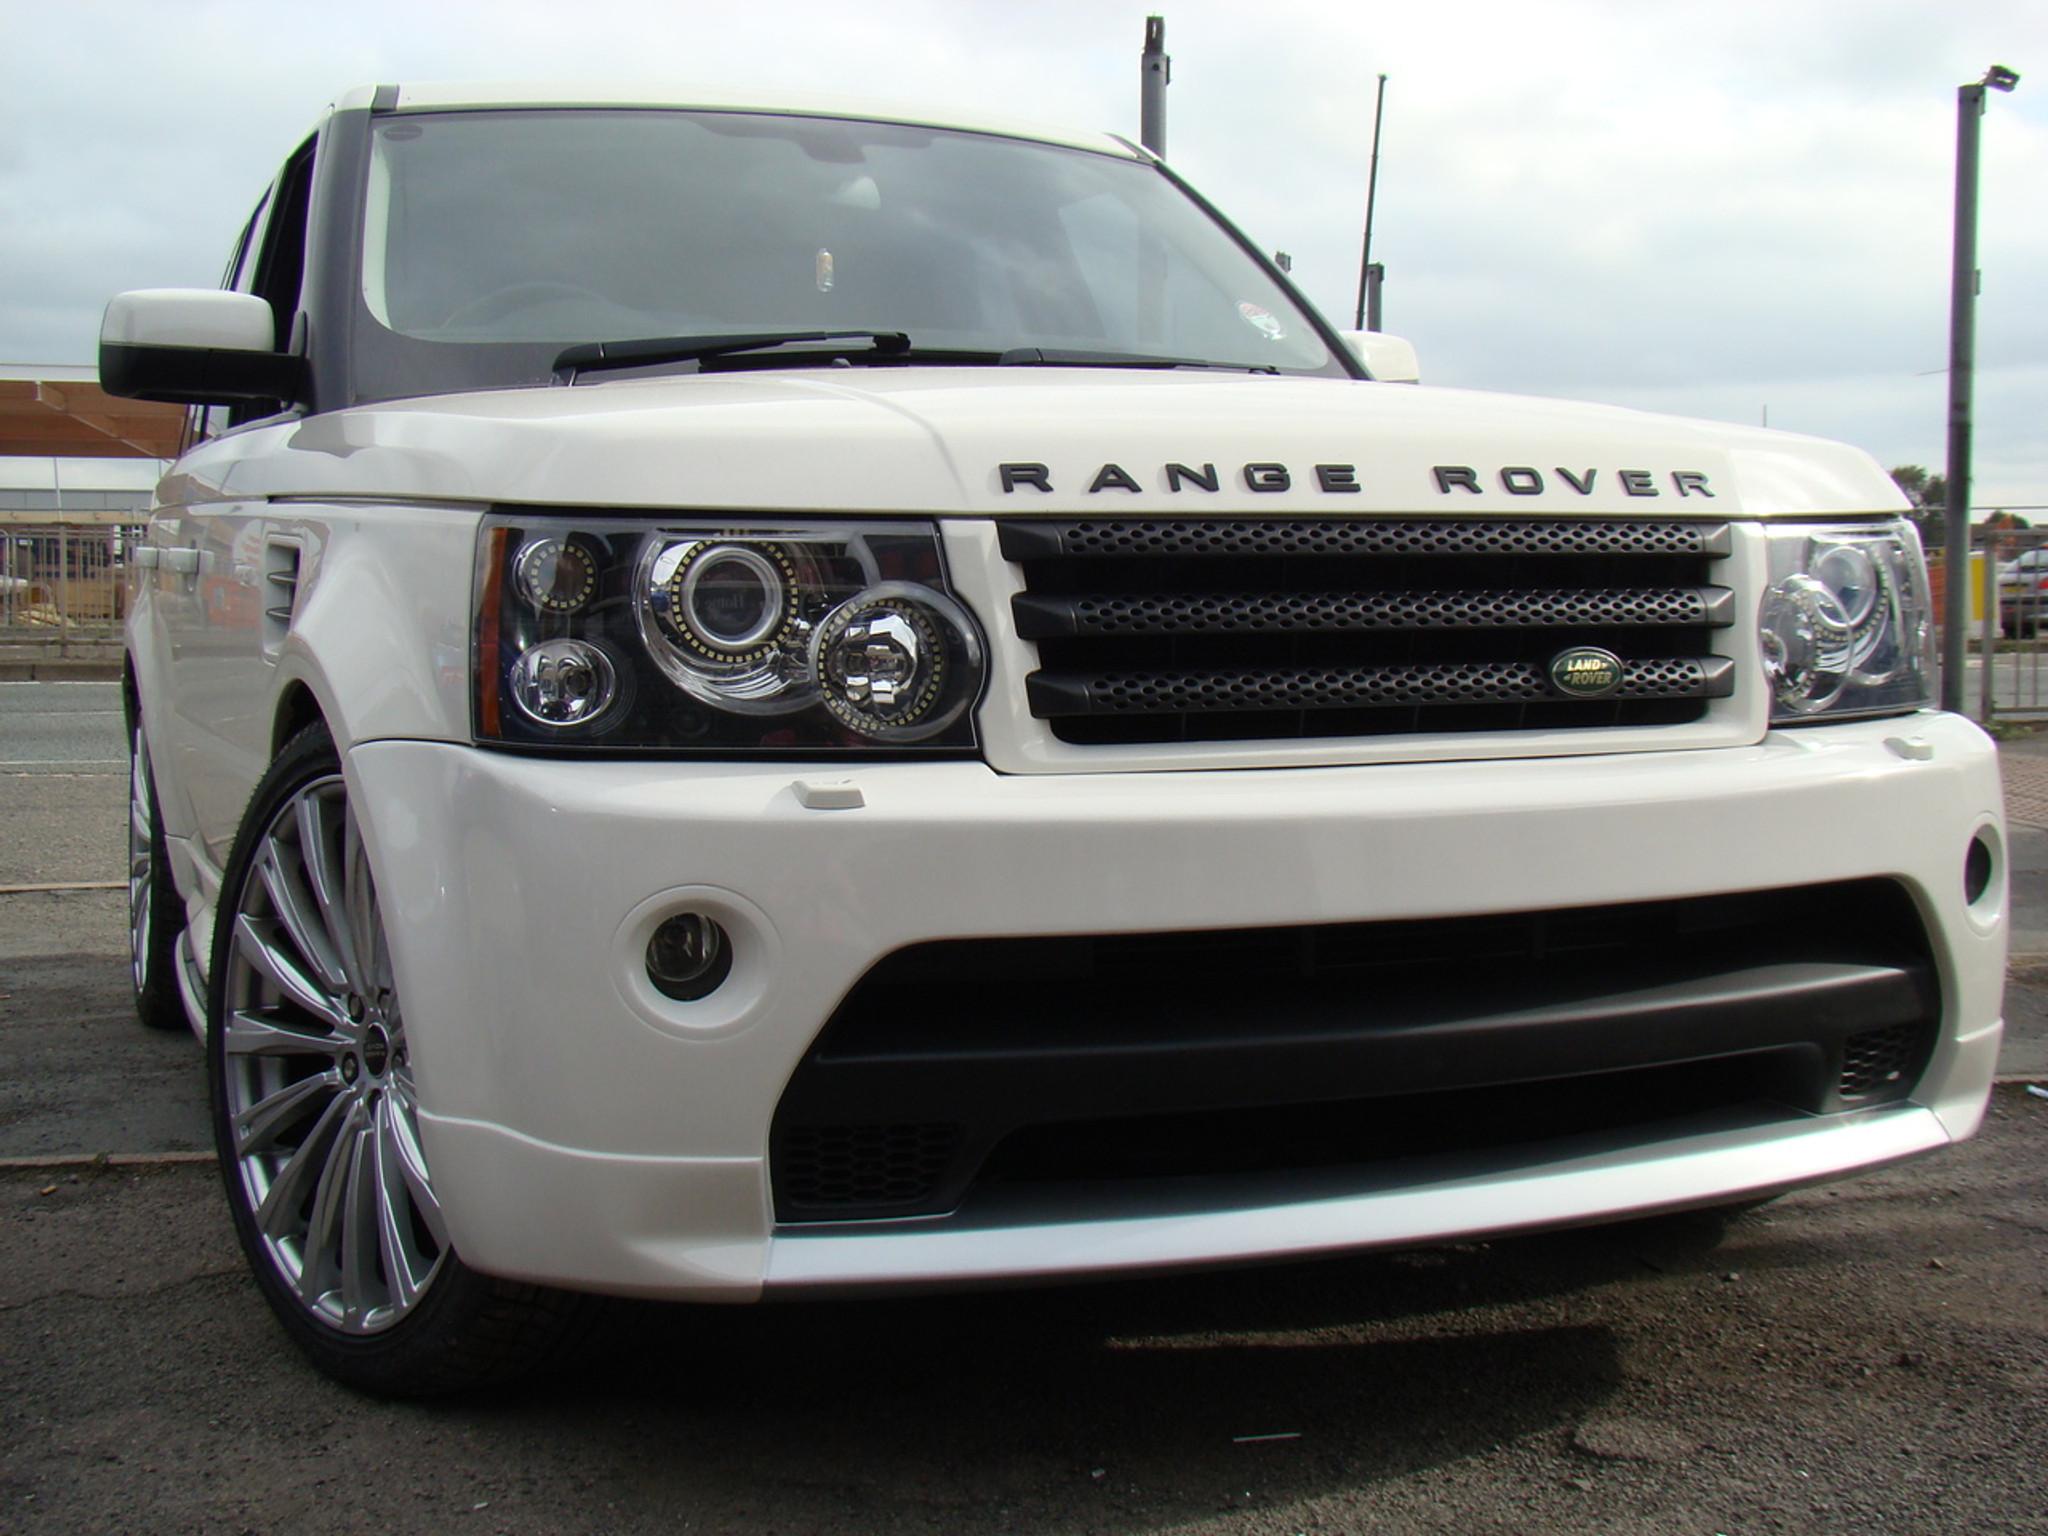 Rover range rover 2005 : Range Rover Sport Autobiography Front Bumper 2005-2009 Models ...